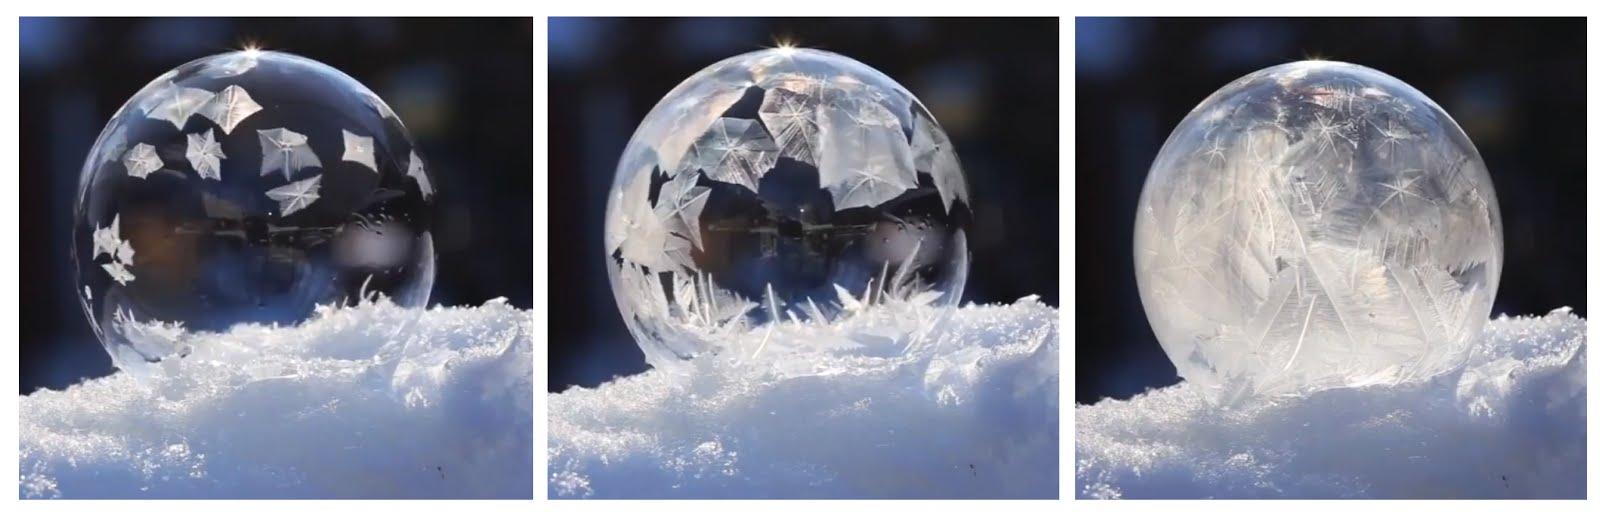 Vídeo; Burbuja de agua congelándose.